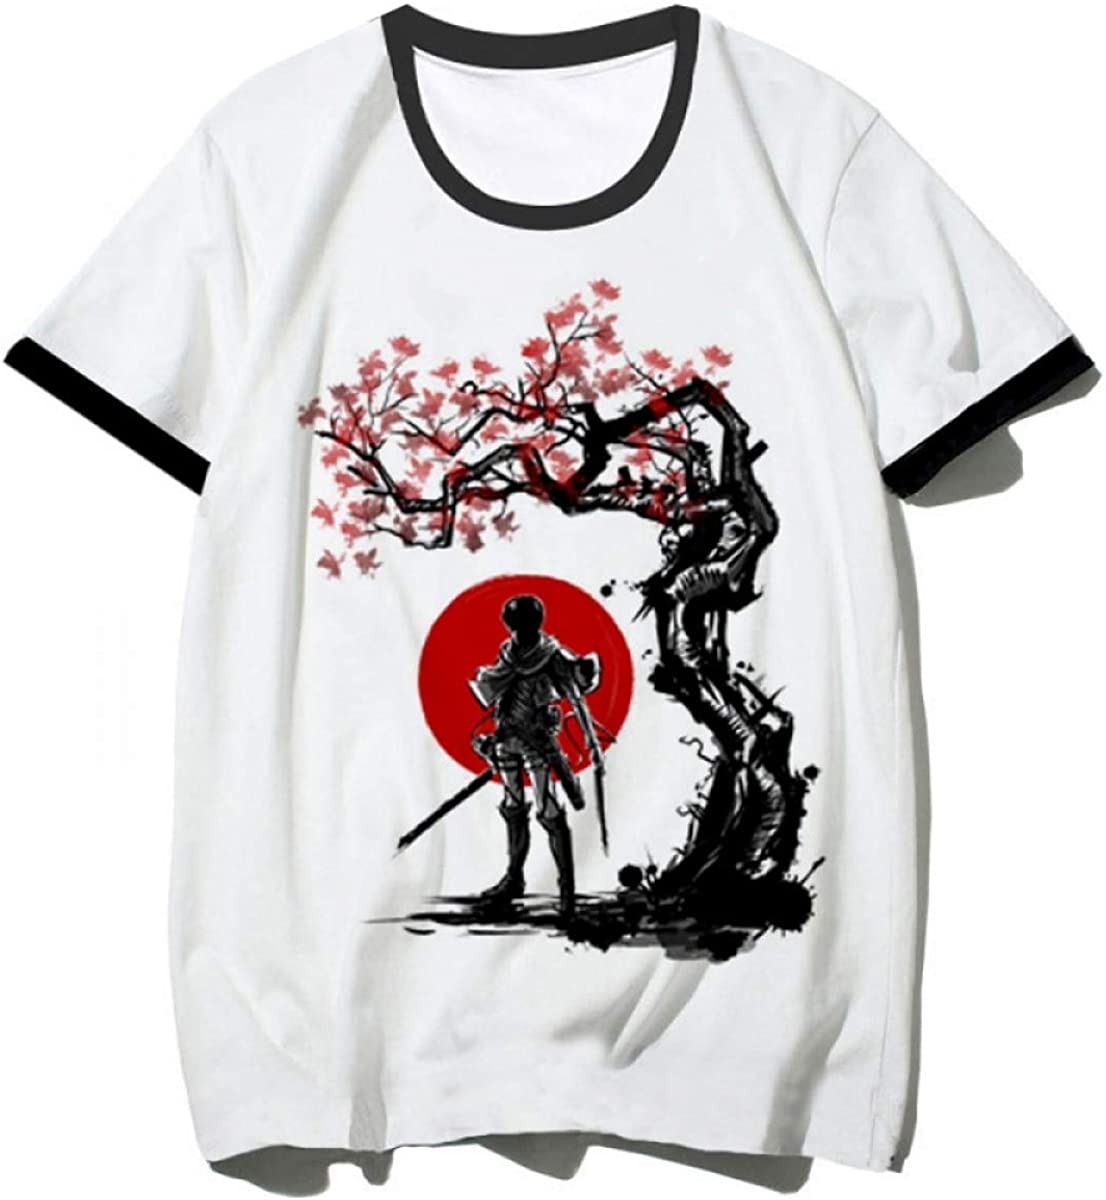 FLAMENCO_STORE Attack on Titan T Shirt Men Shingeki No Kyojin T-Shirt Funny Printed Tshirt: Amazon.es: Ropa y accesorios